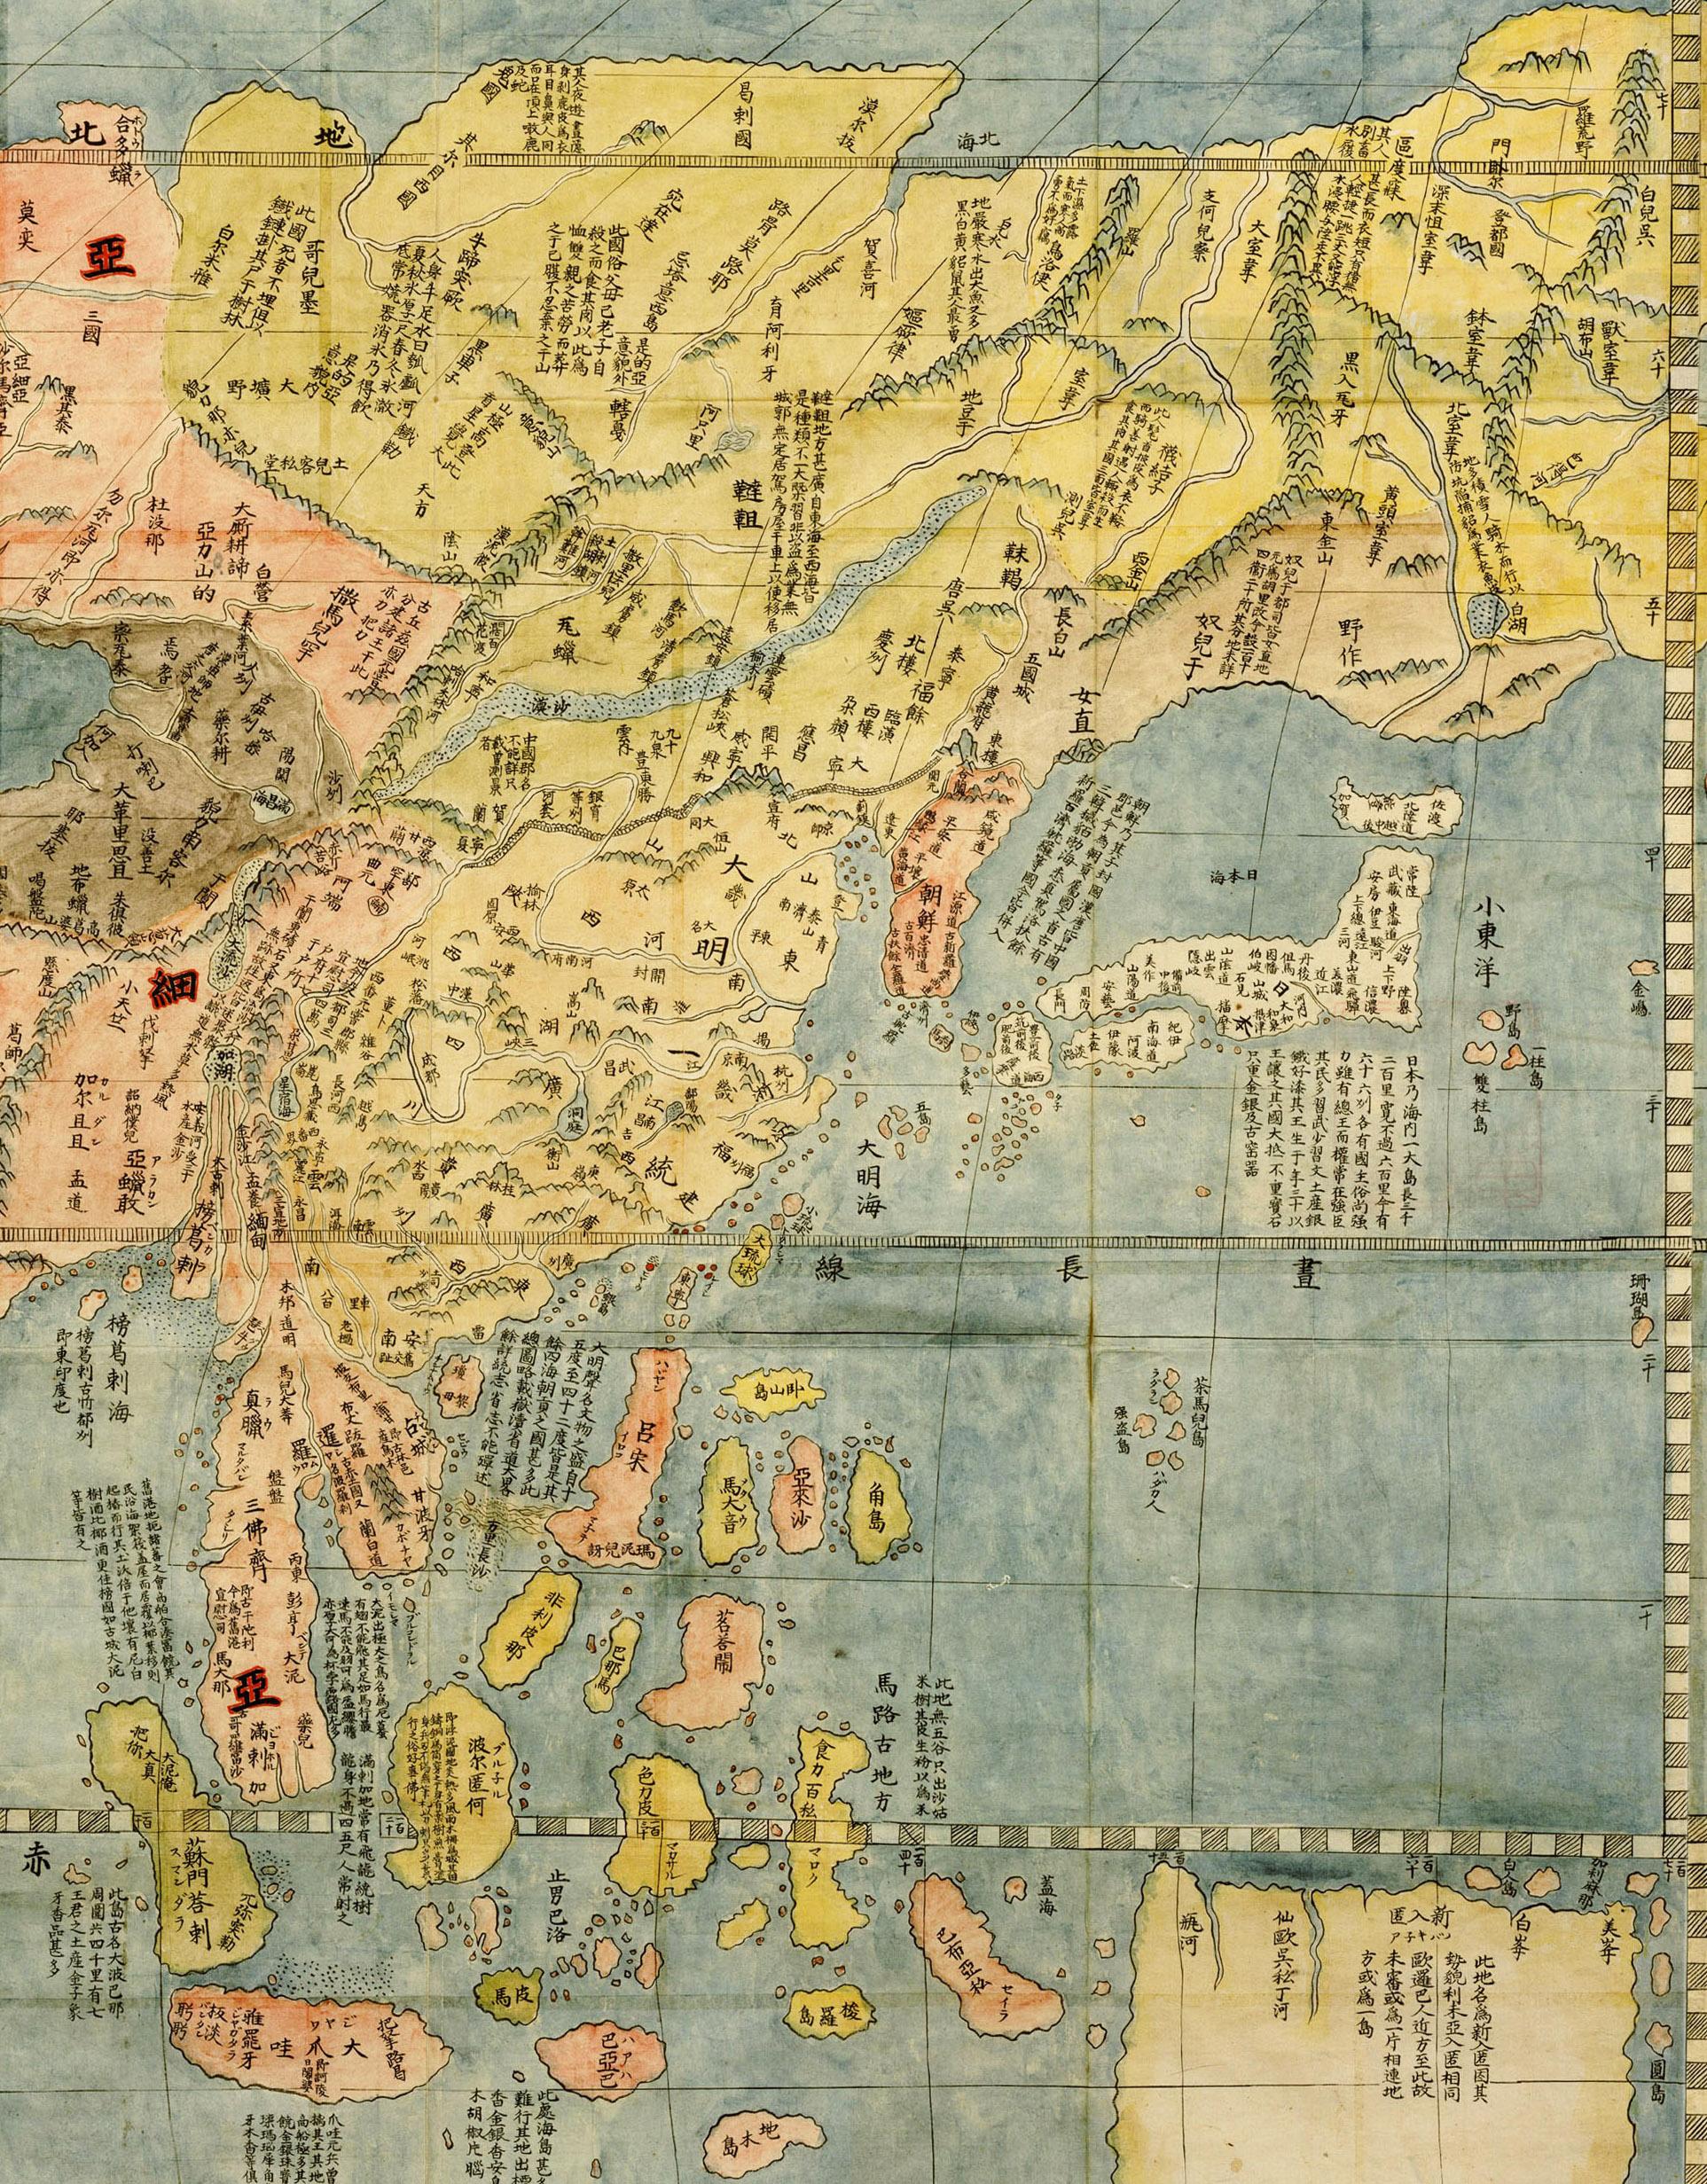 FileMatteo Ricci Far East 1602 Largerjpg  Wikimedia Commons